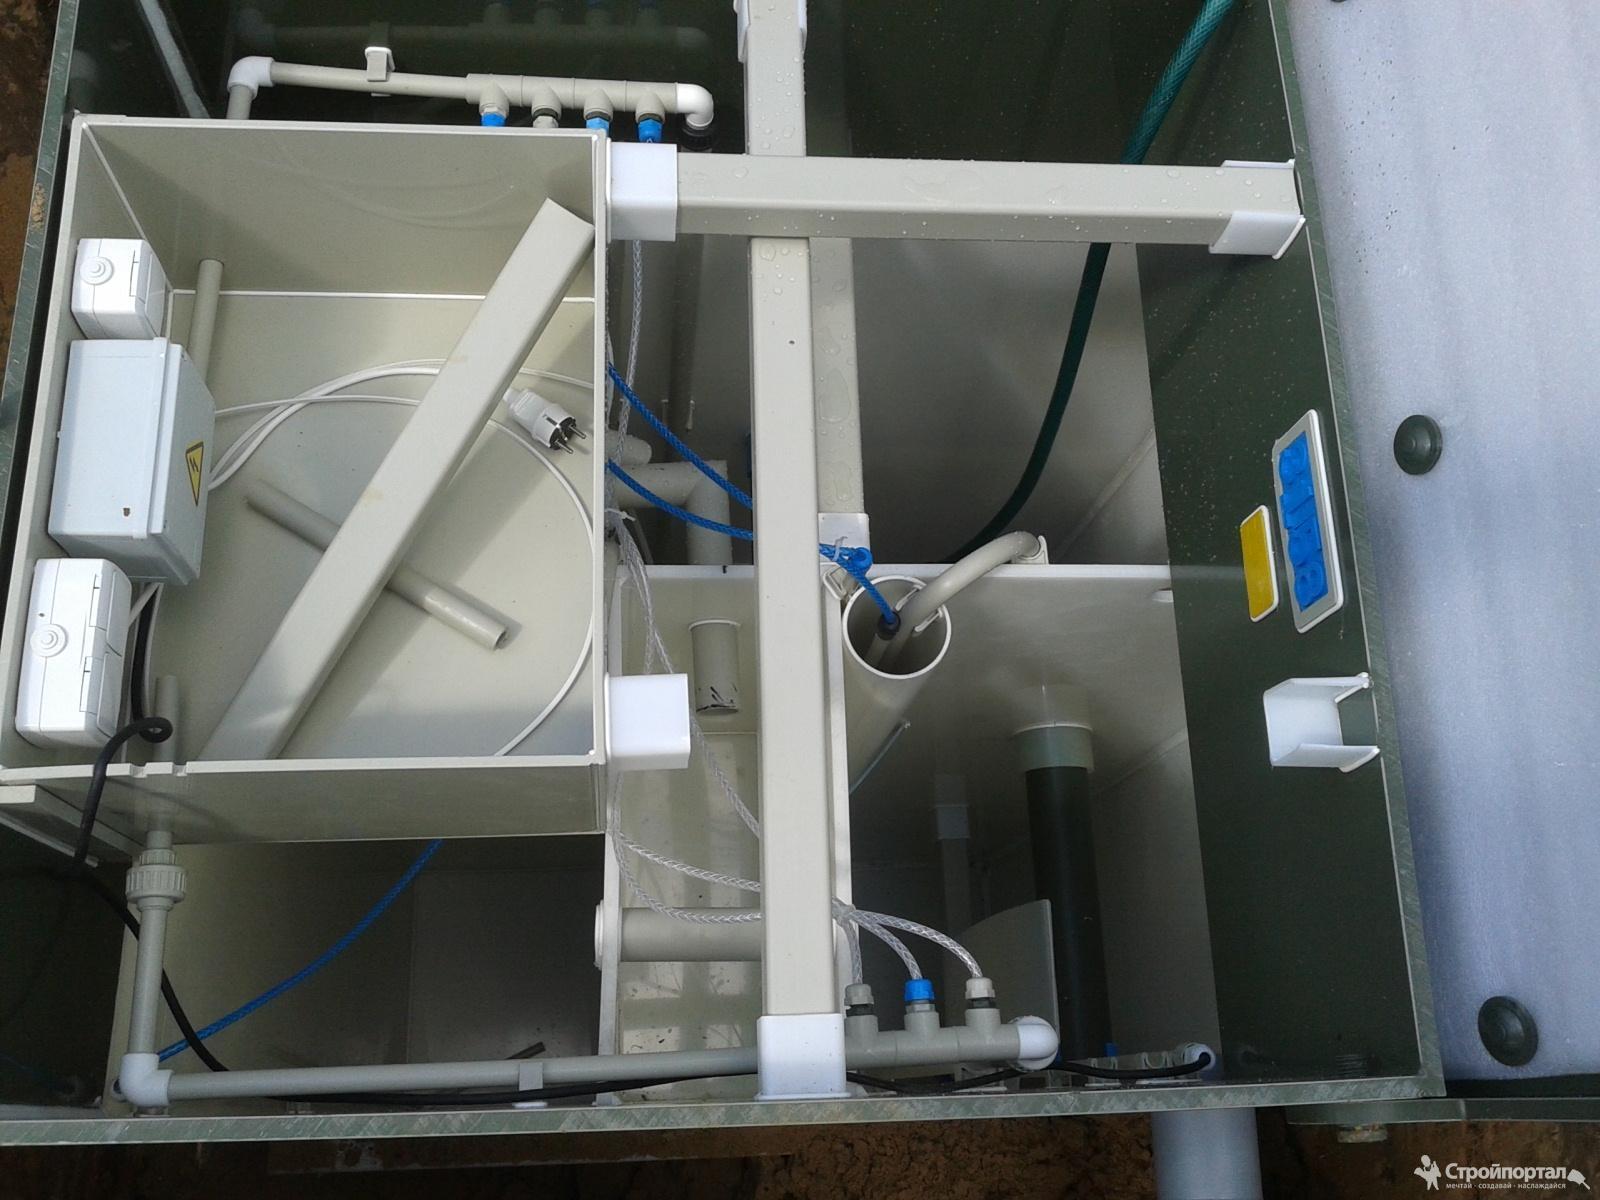 Устройство септика и автономной канализации Эко-гранд